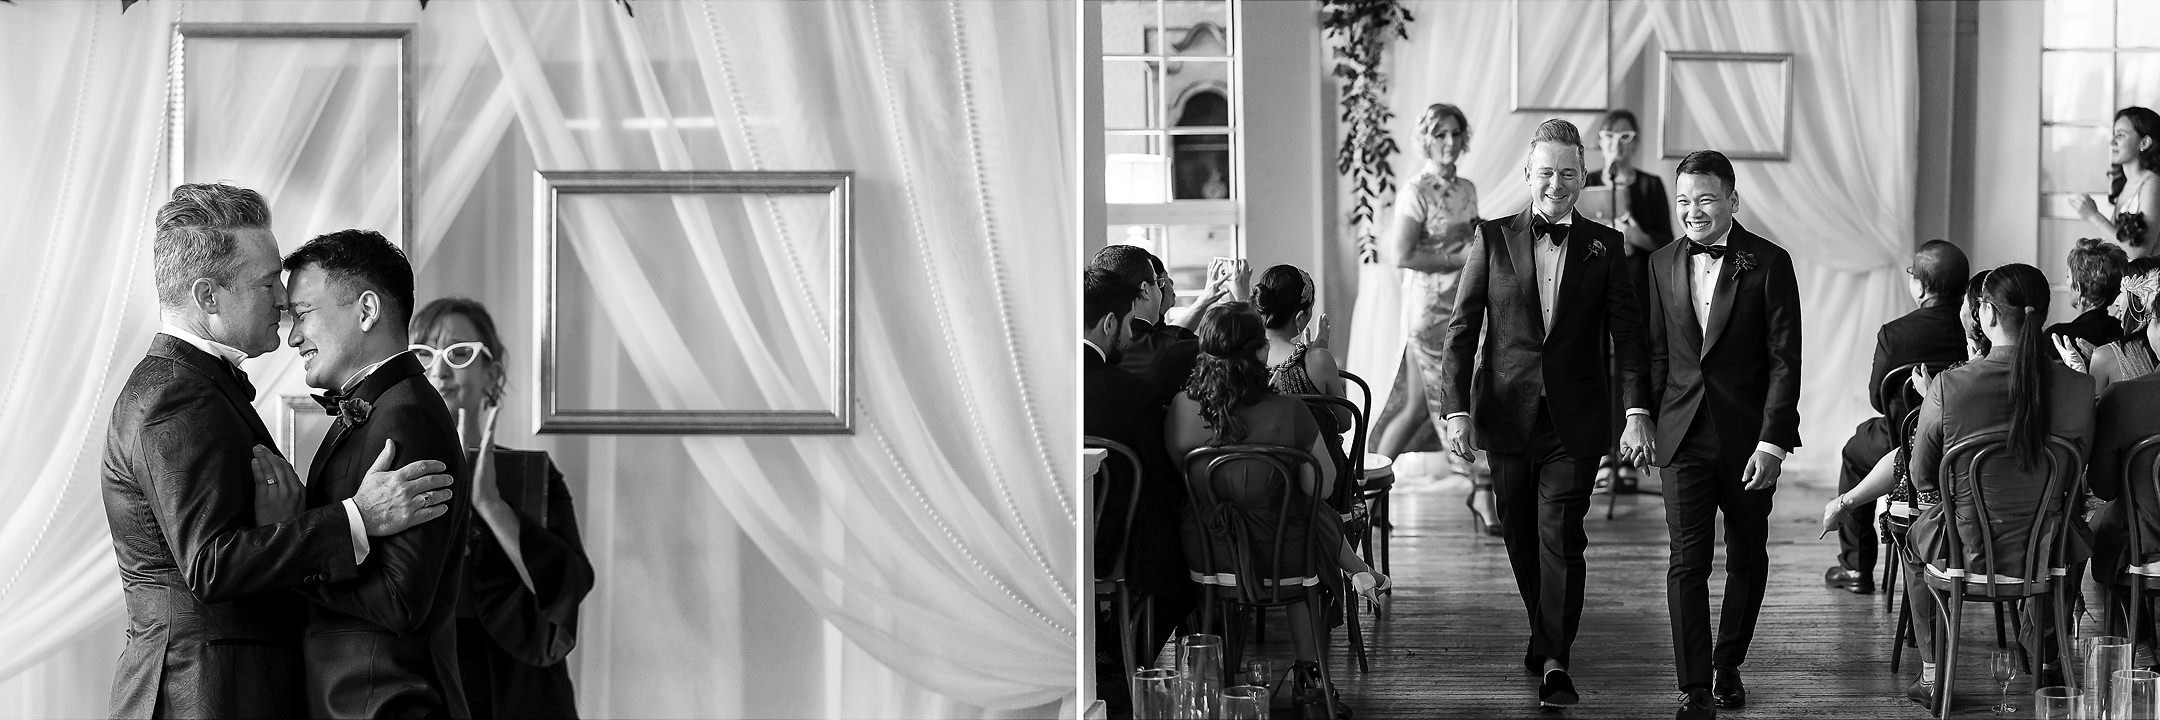 Metropolitan Building wedding 10.jpg